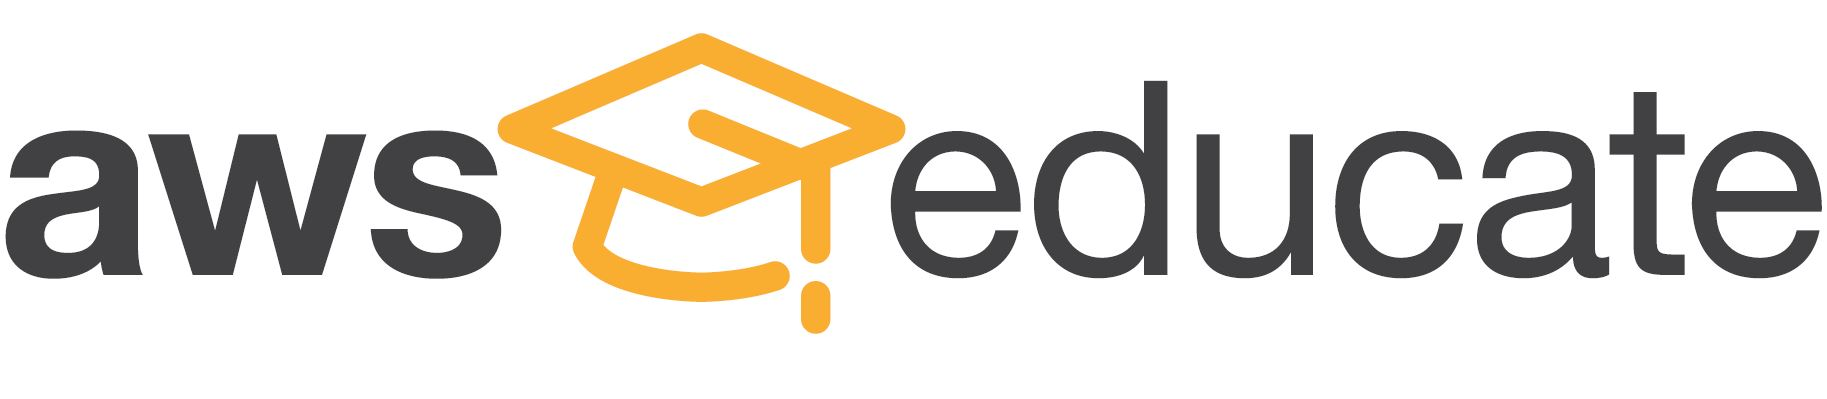 AWS Educate Logo (1).JPG